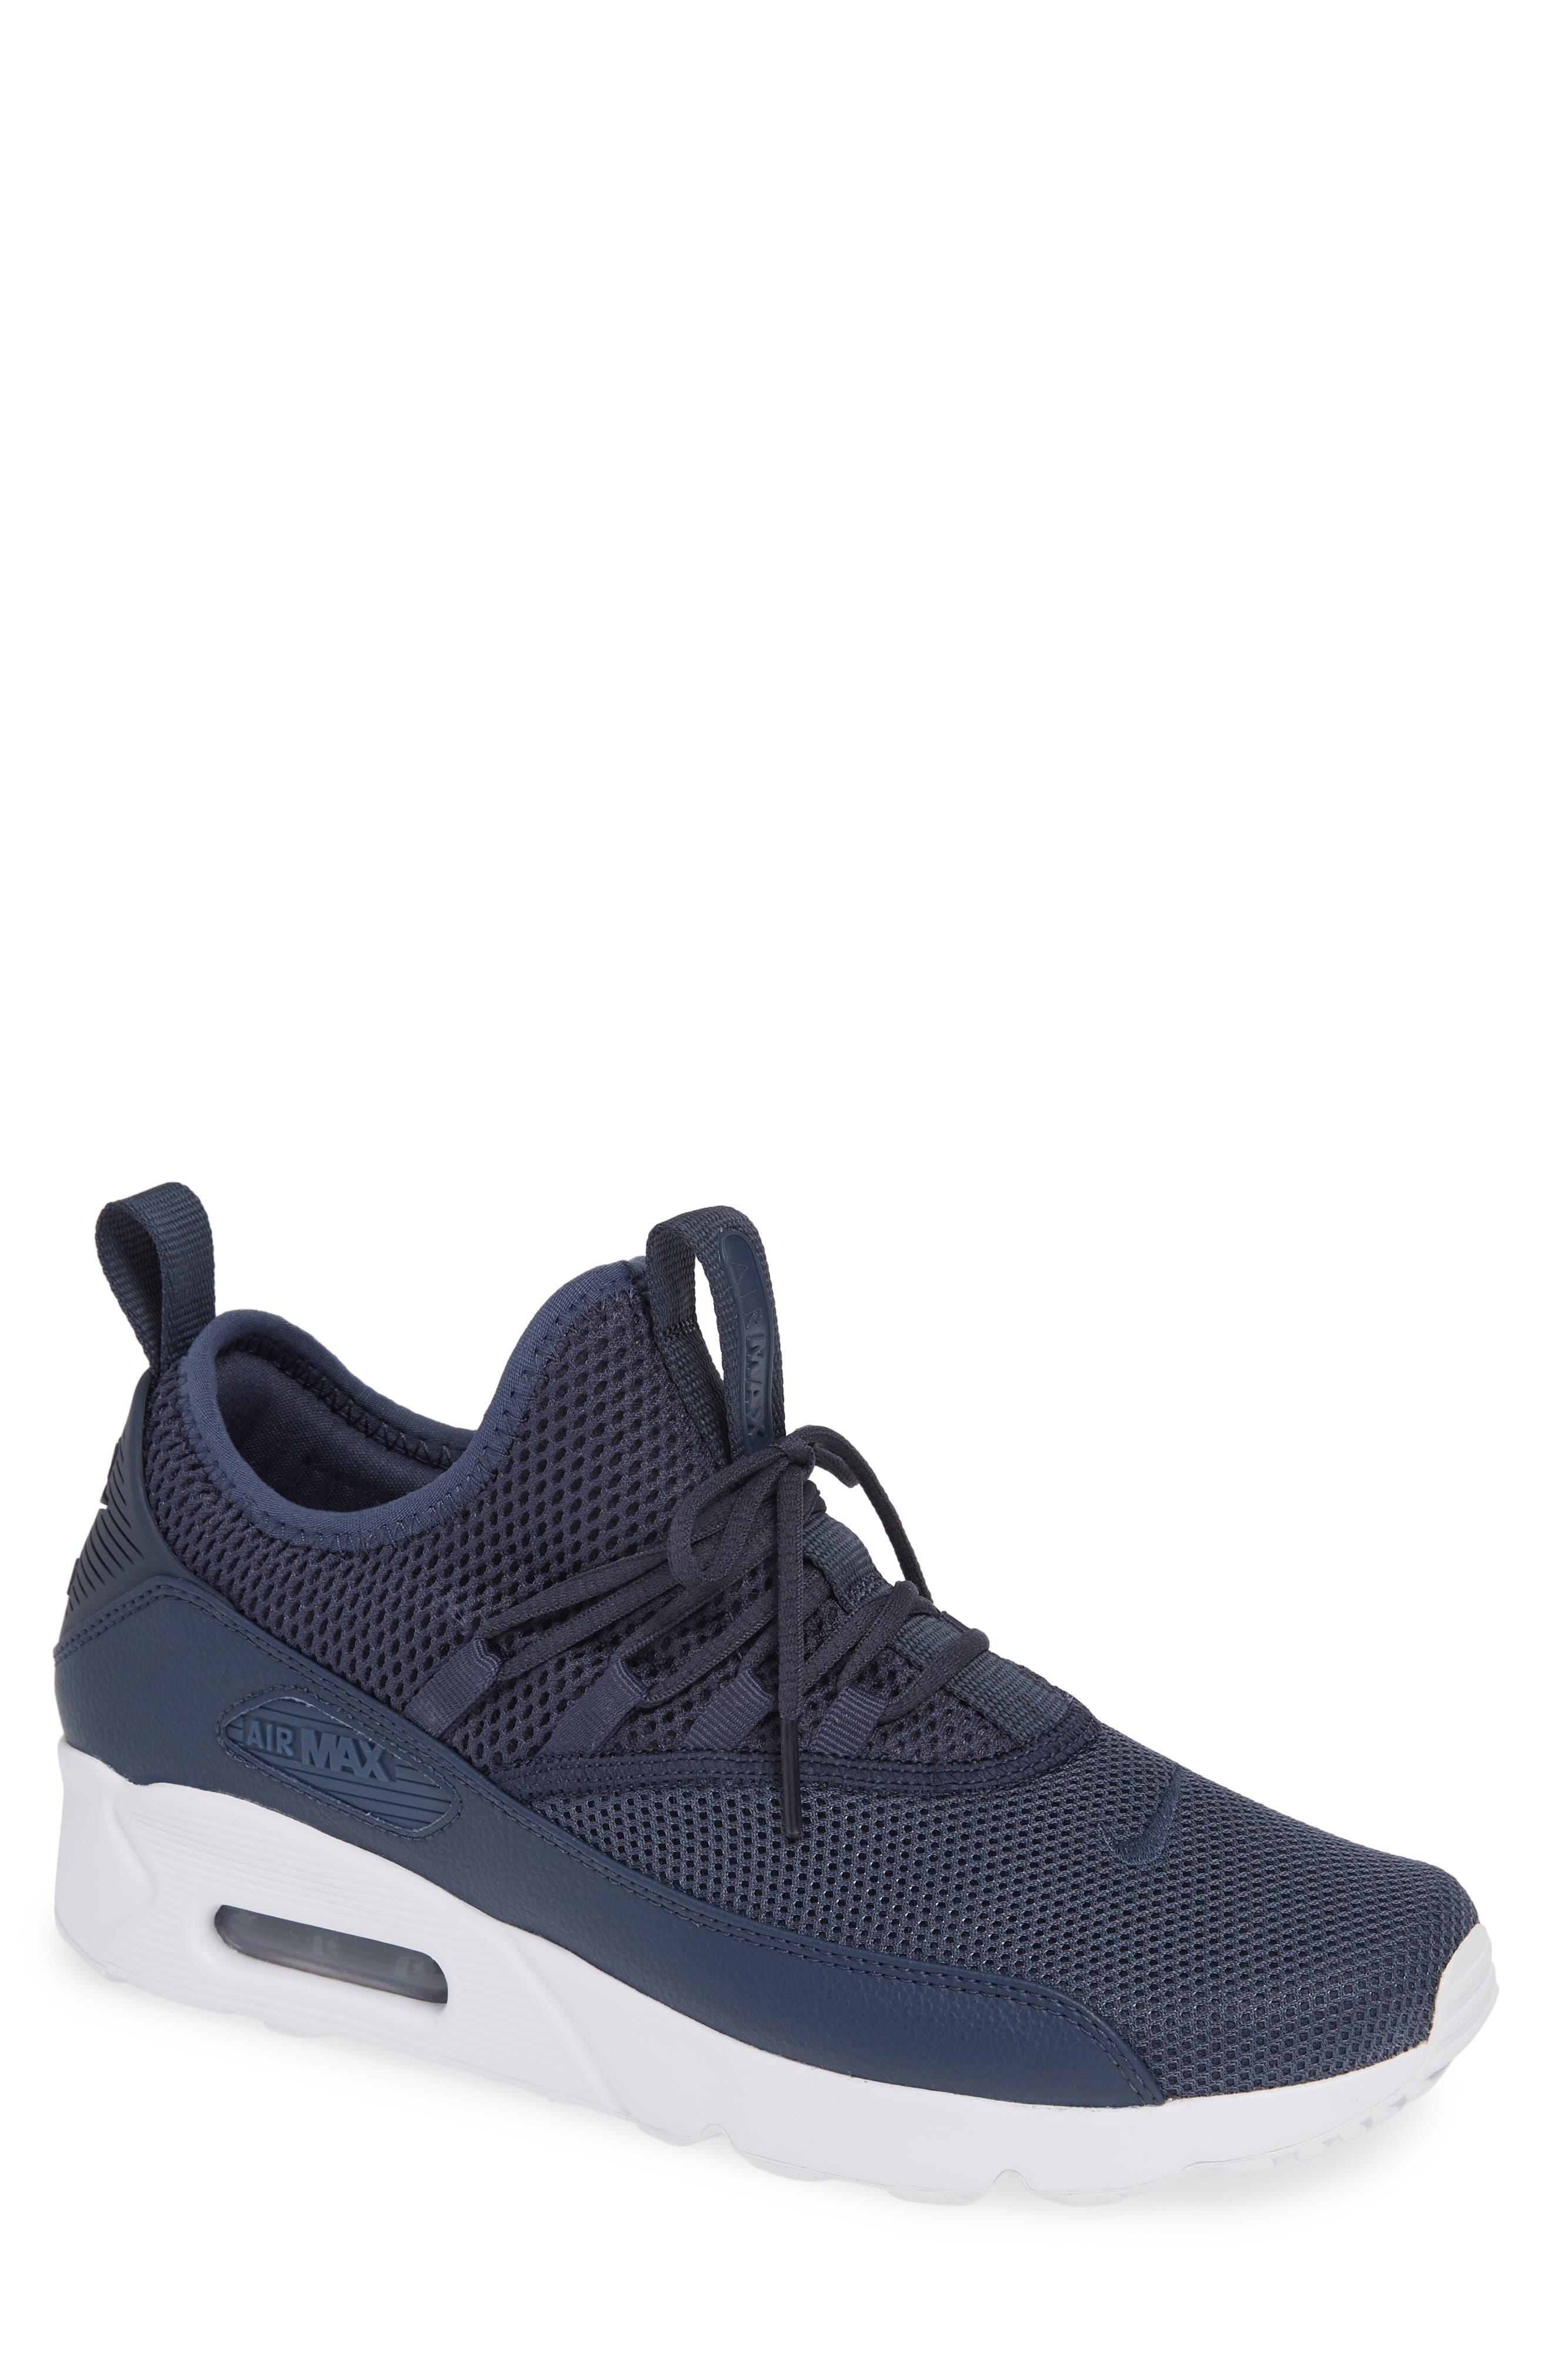 Air Max 90 EZ Sneaker,                             Main thumbnail 1, color,                             THUNDER BLUE/ WHITE